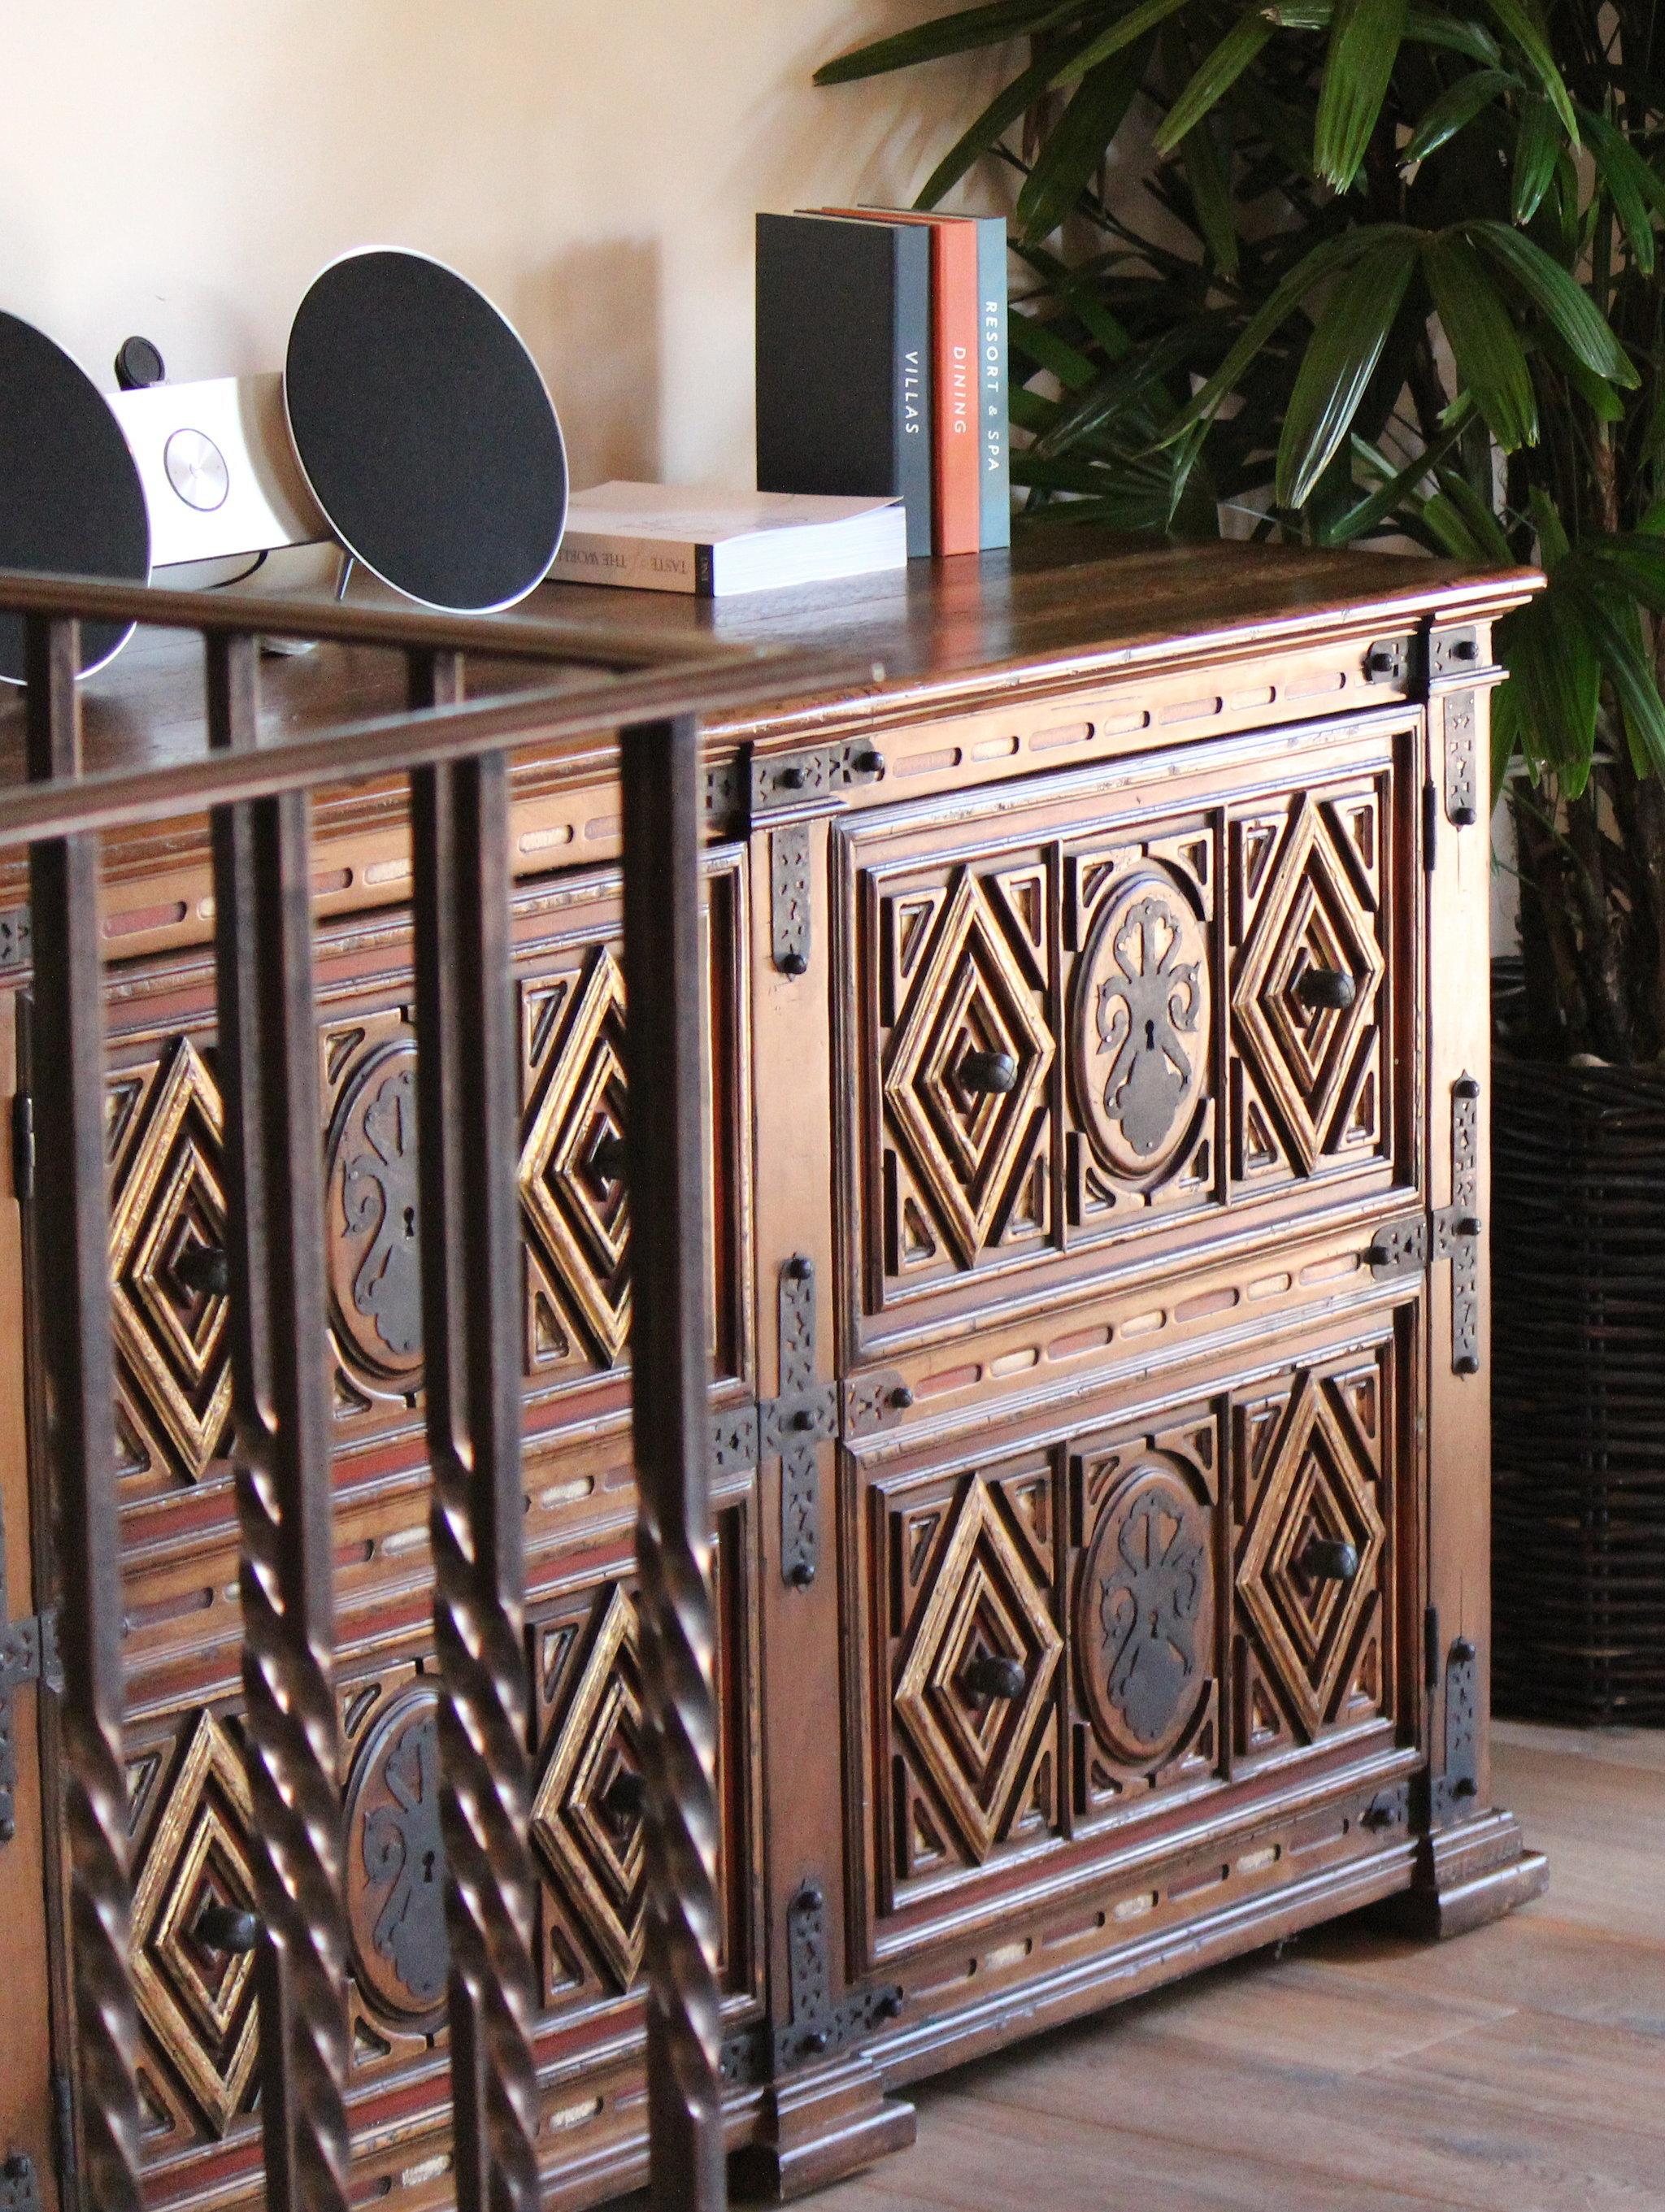 Carved Wooden Furniture 12 Ways To Make Your Home Feel Like A Mediterranean Resort Popsugar